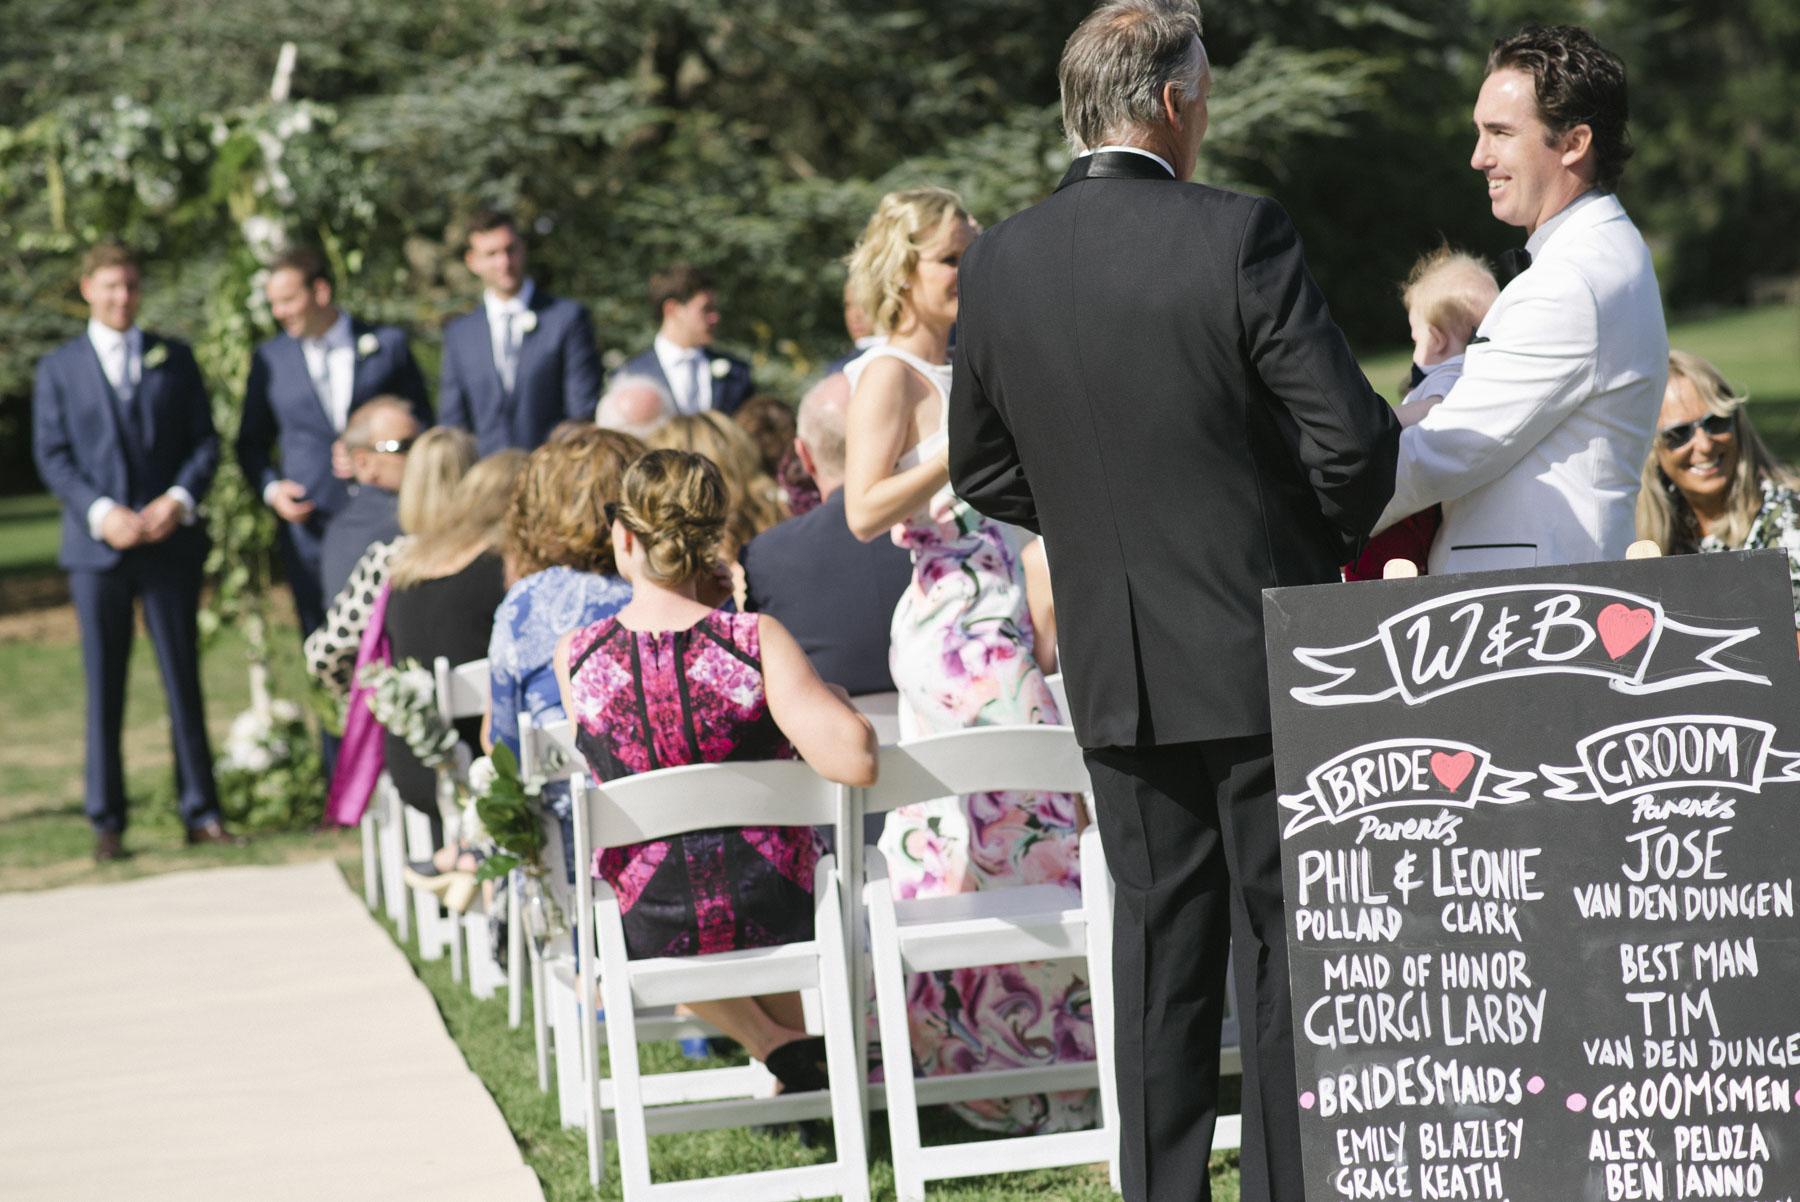 1501vand-146alan_moyle_wedding_portrait_brighton_bayside_werribee_estate_mansion_zoo_rustic_styled_garden_mansion_candid_documentry_victoria_whitelaw.jpg